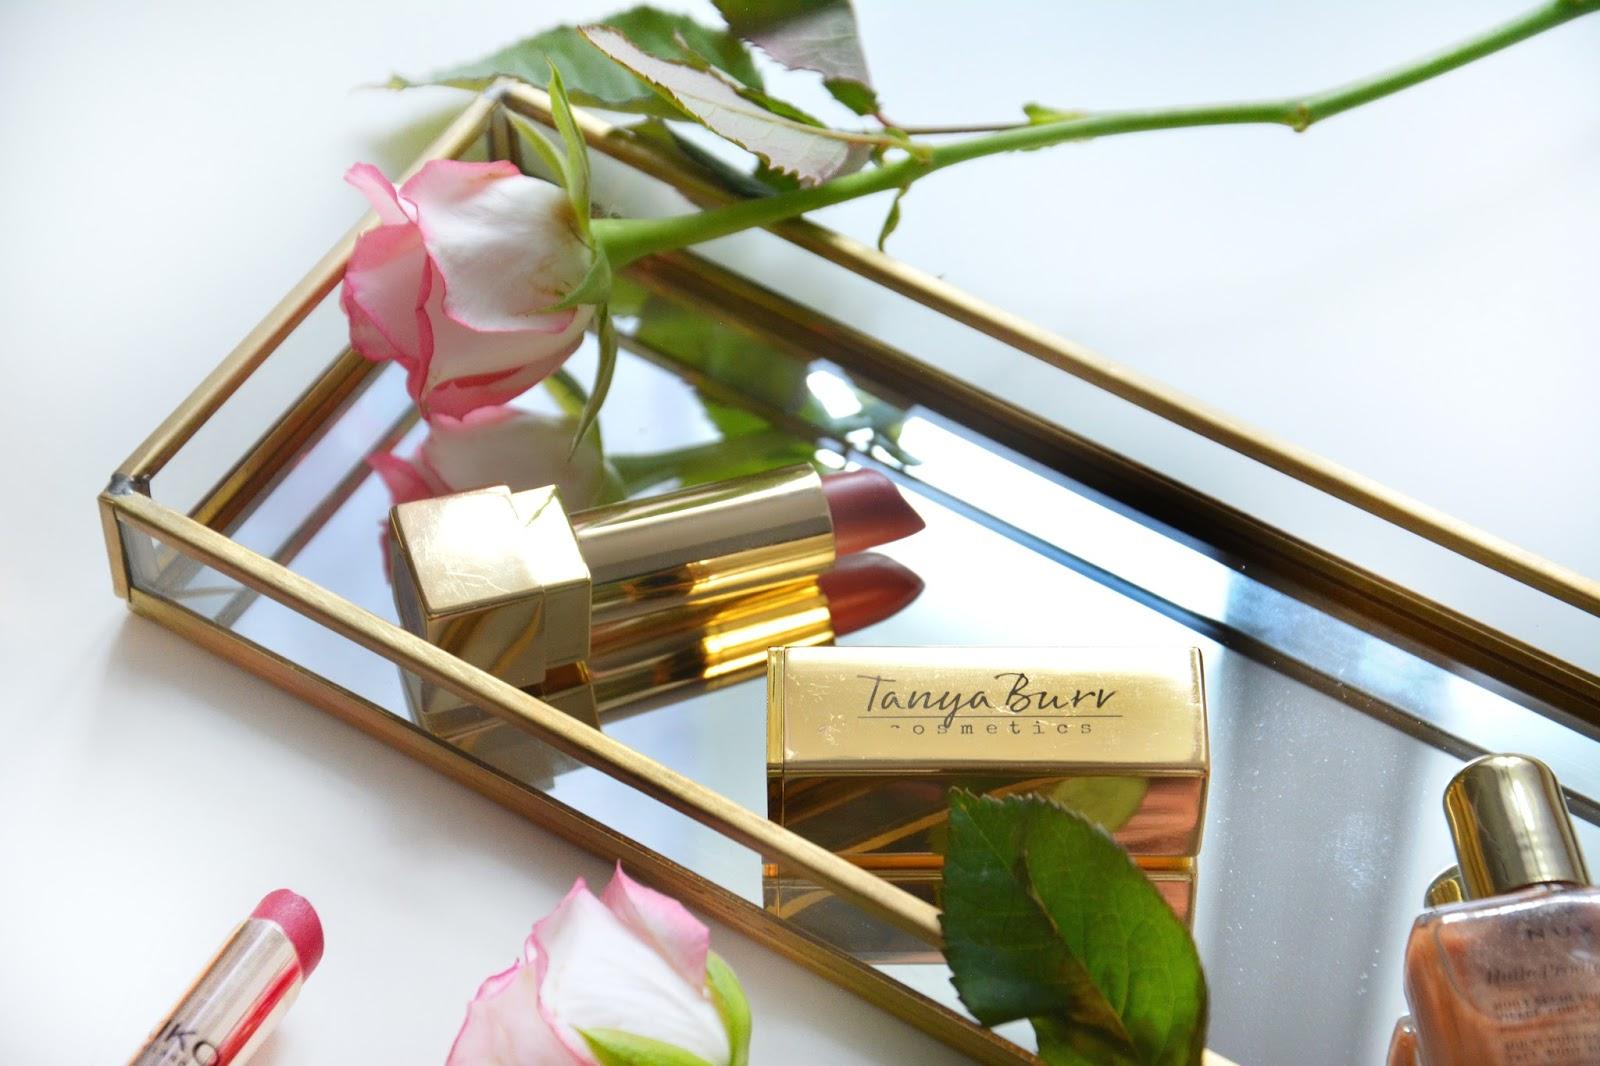 Tanya Burr Lipstick; Kiko Lipstick; Nuxe Oil; Fresh Pink Roses